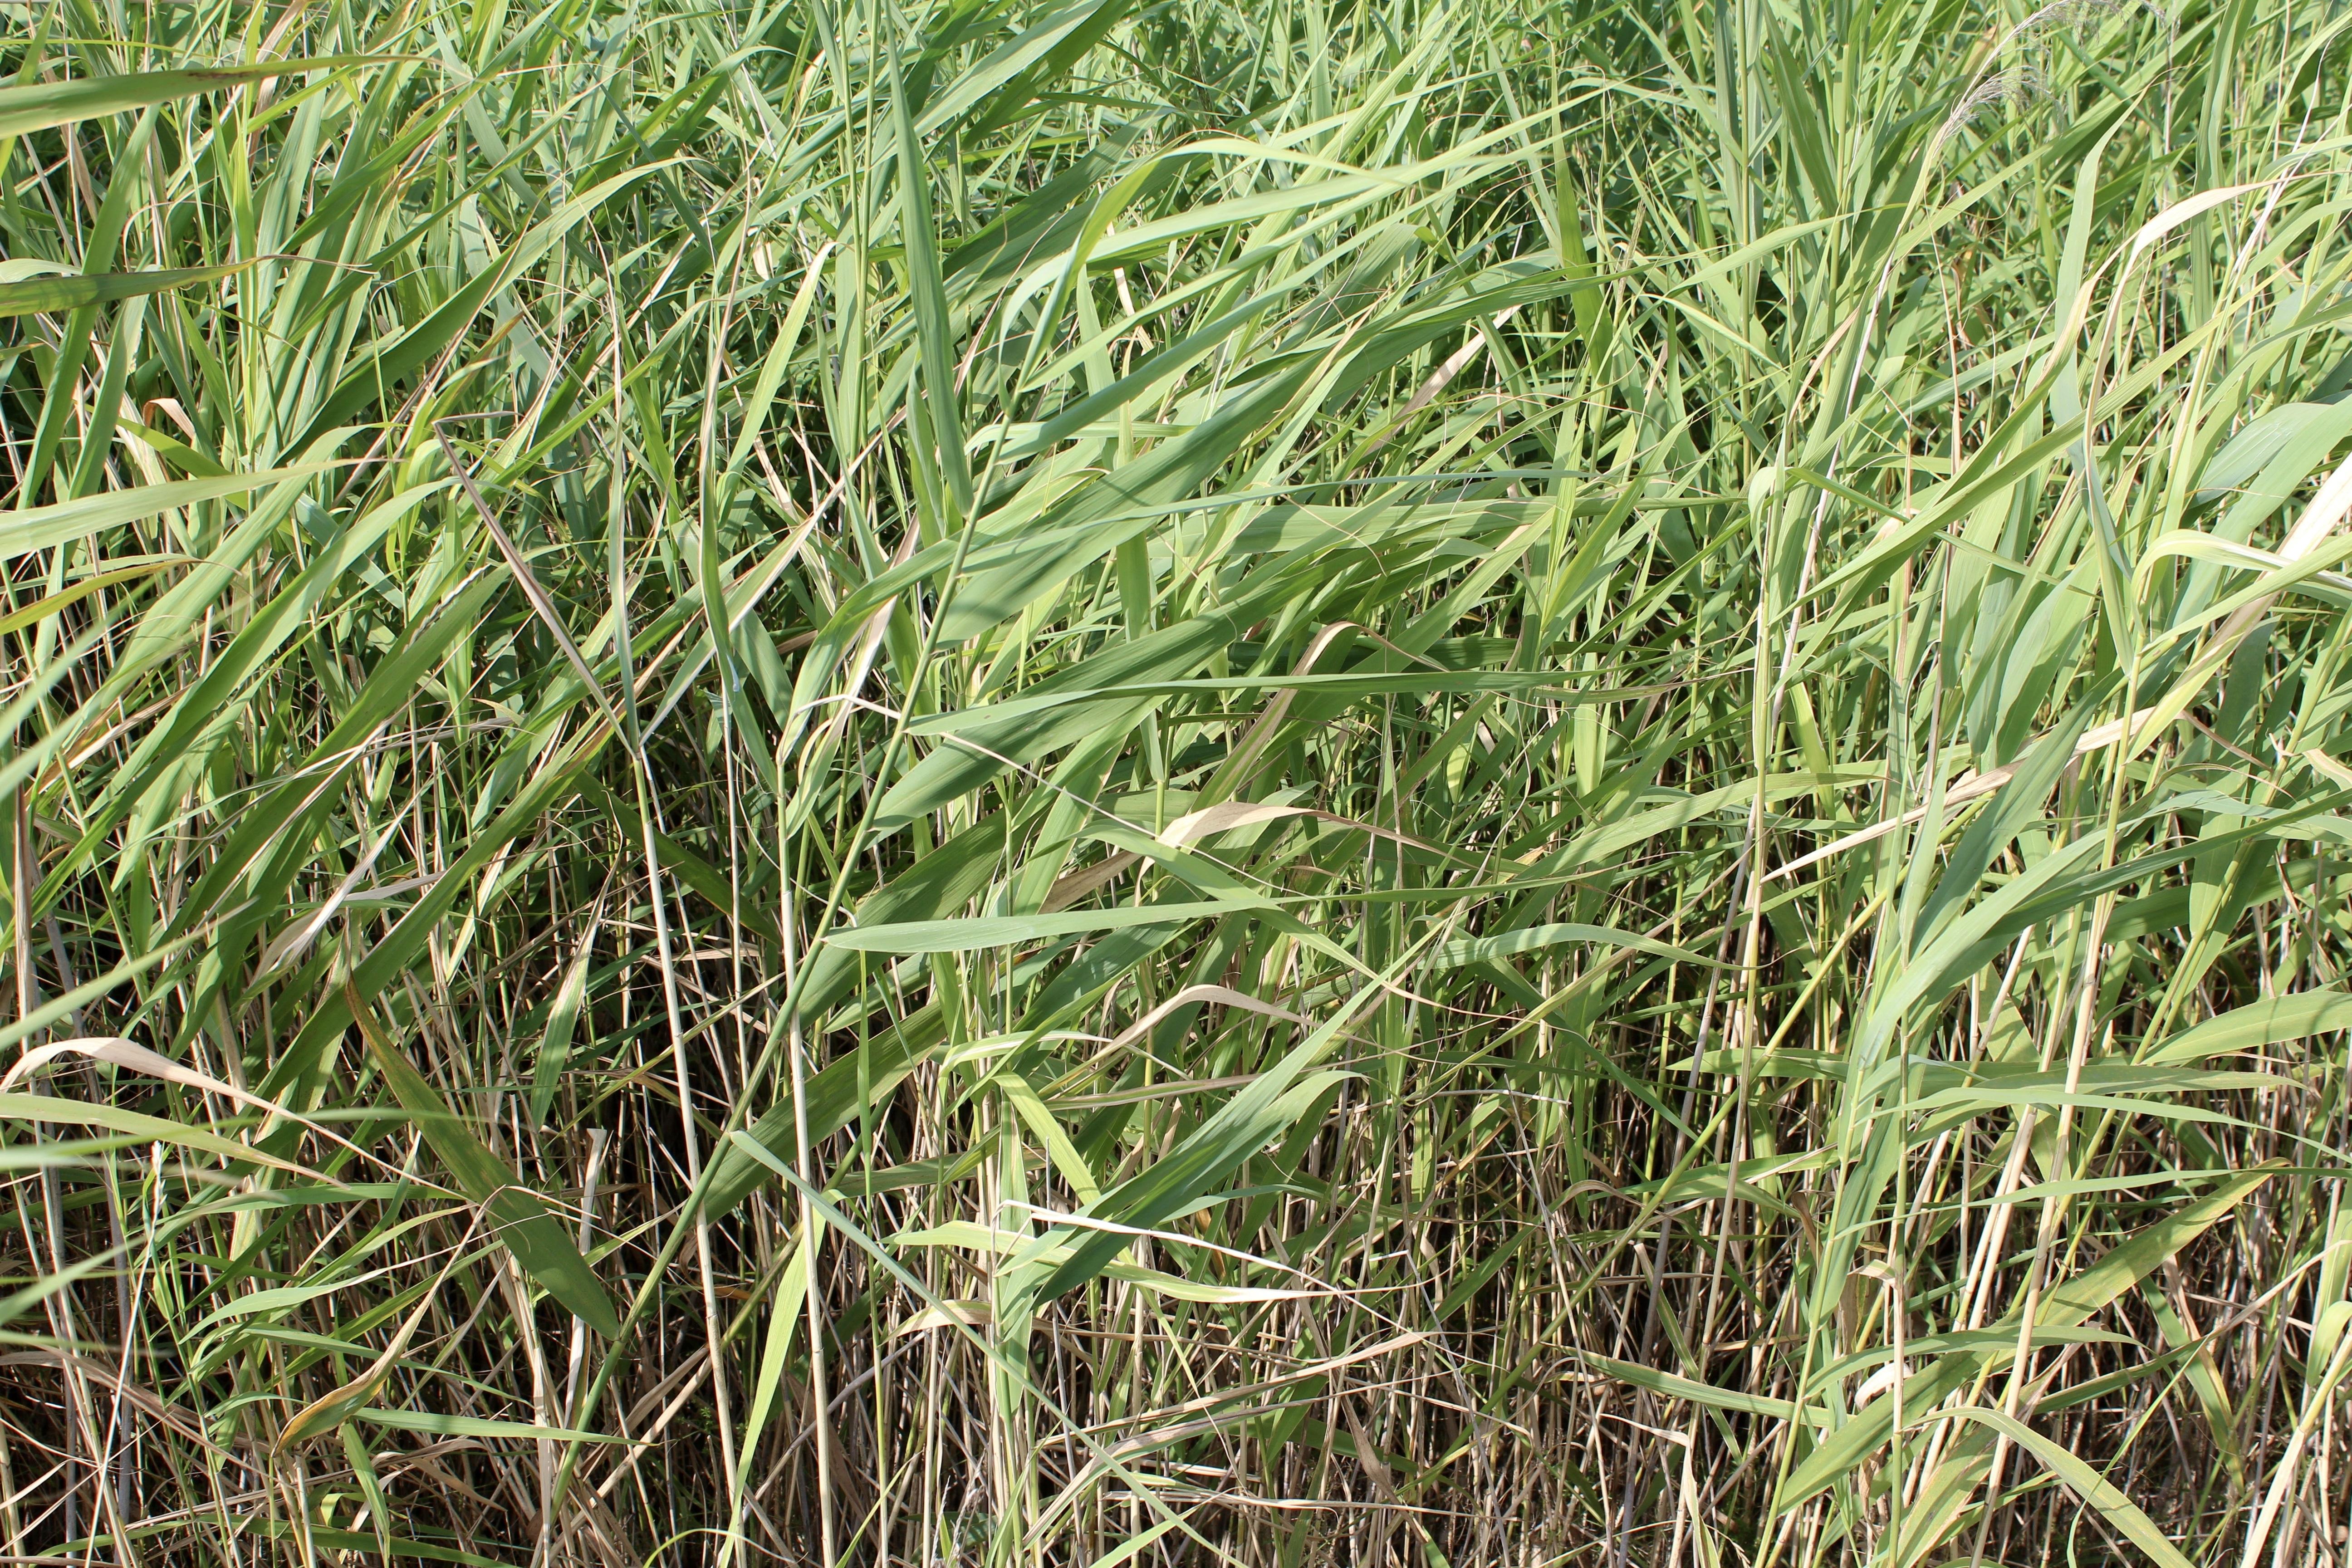 grass plant field lawn meadow prairie texture flower green crop soil agriculture background grassland wallpaper bamboo